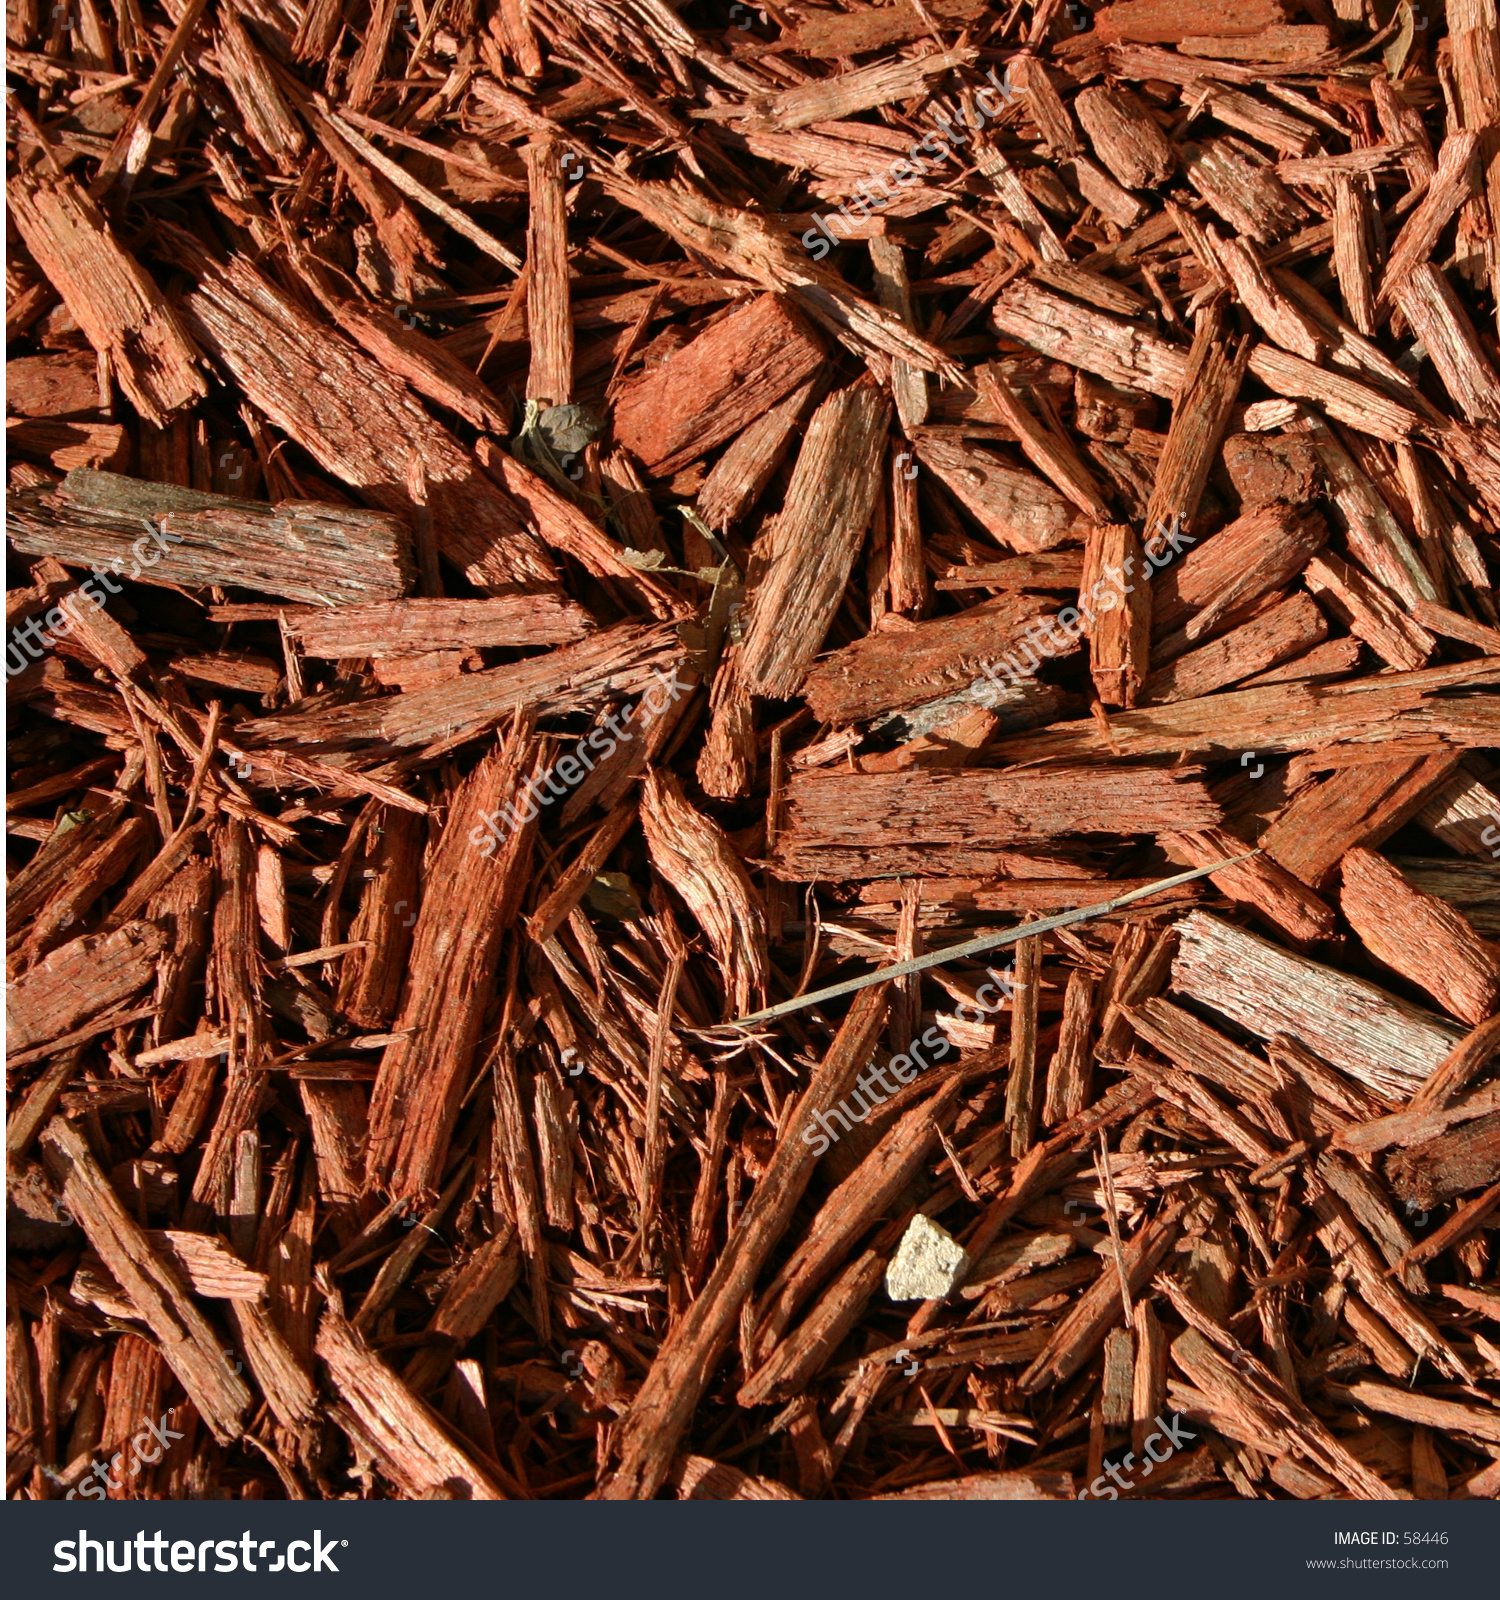 Redwood Mulch Stock Photo 58446 : Shutterstock.